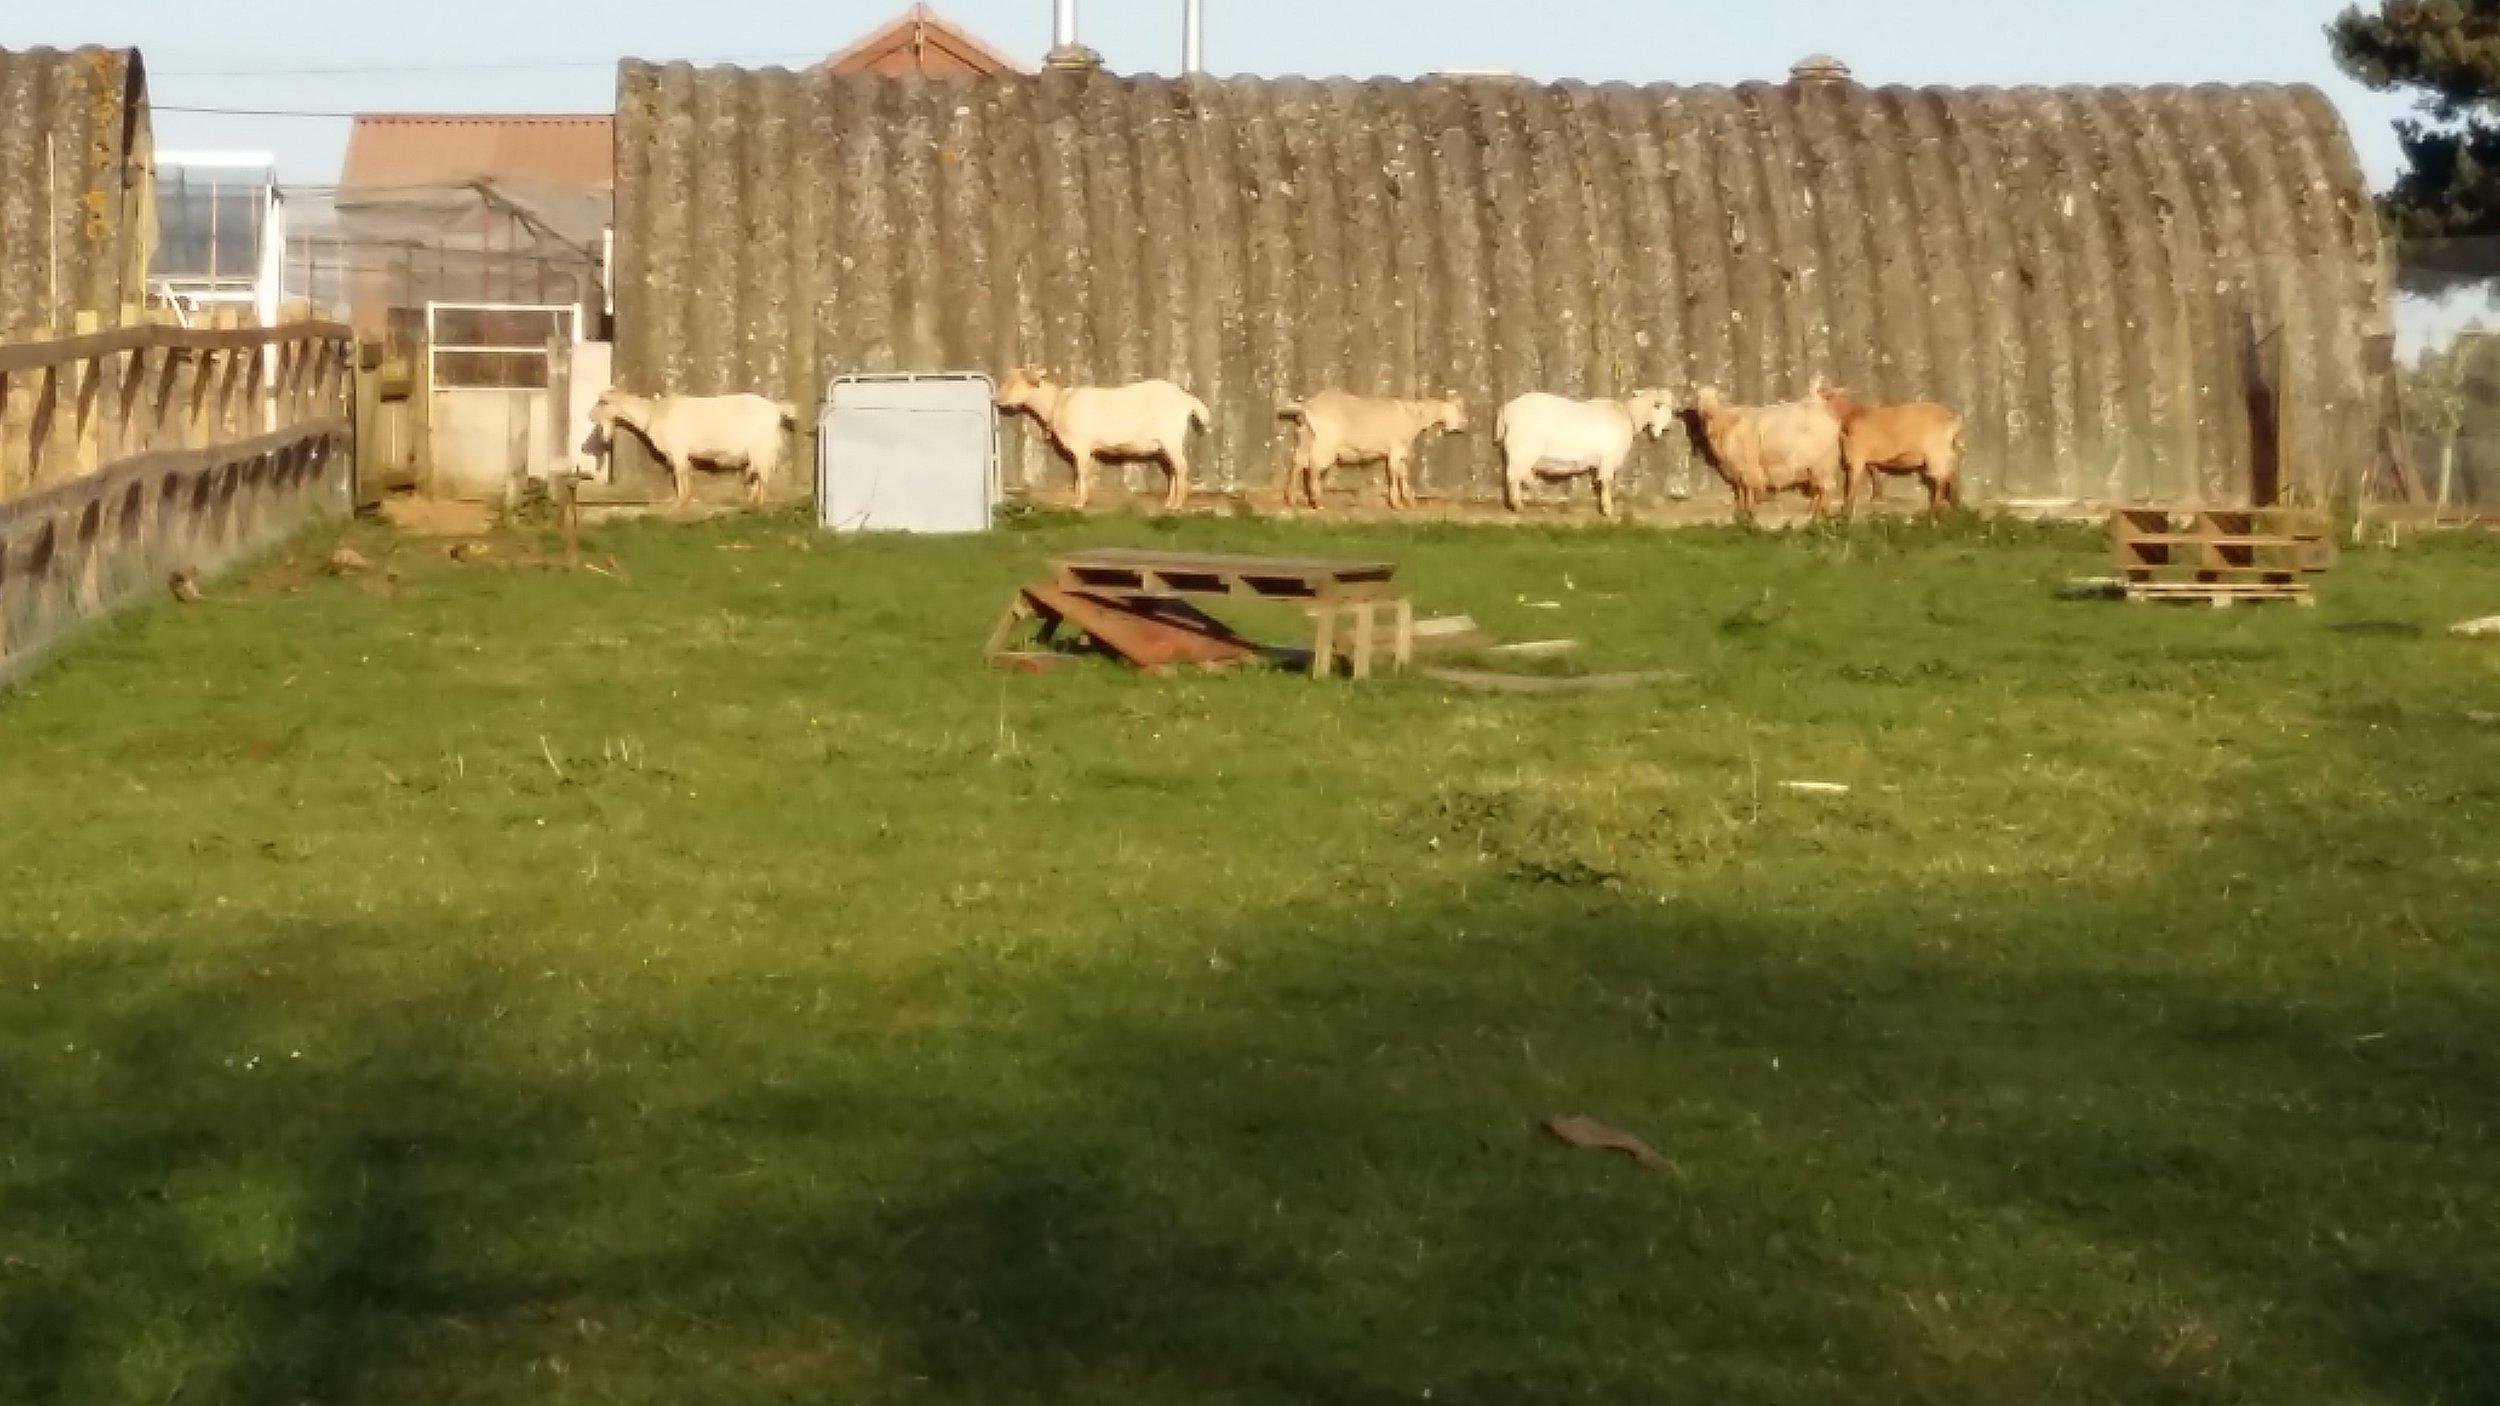 Goats And Nissen Hut